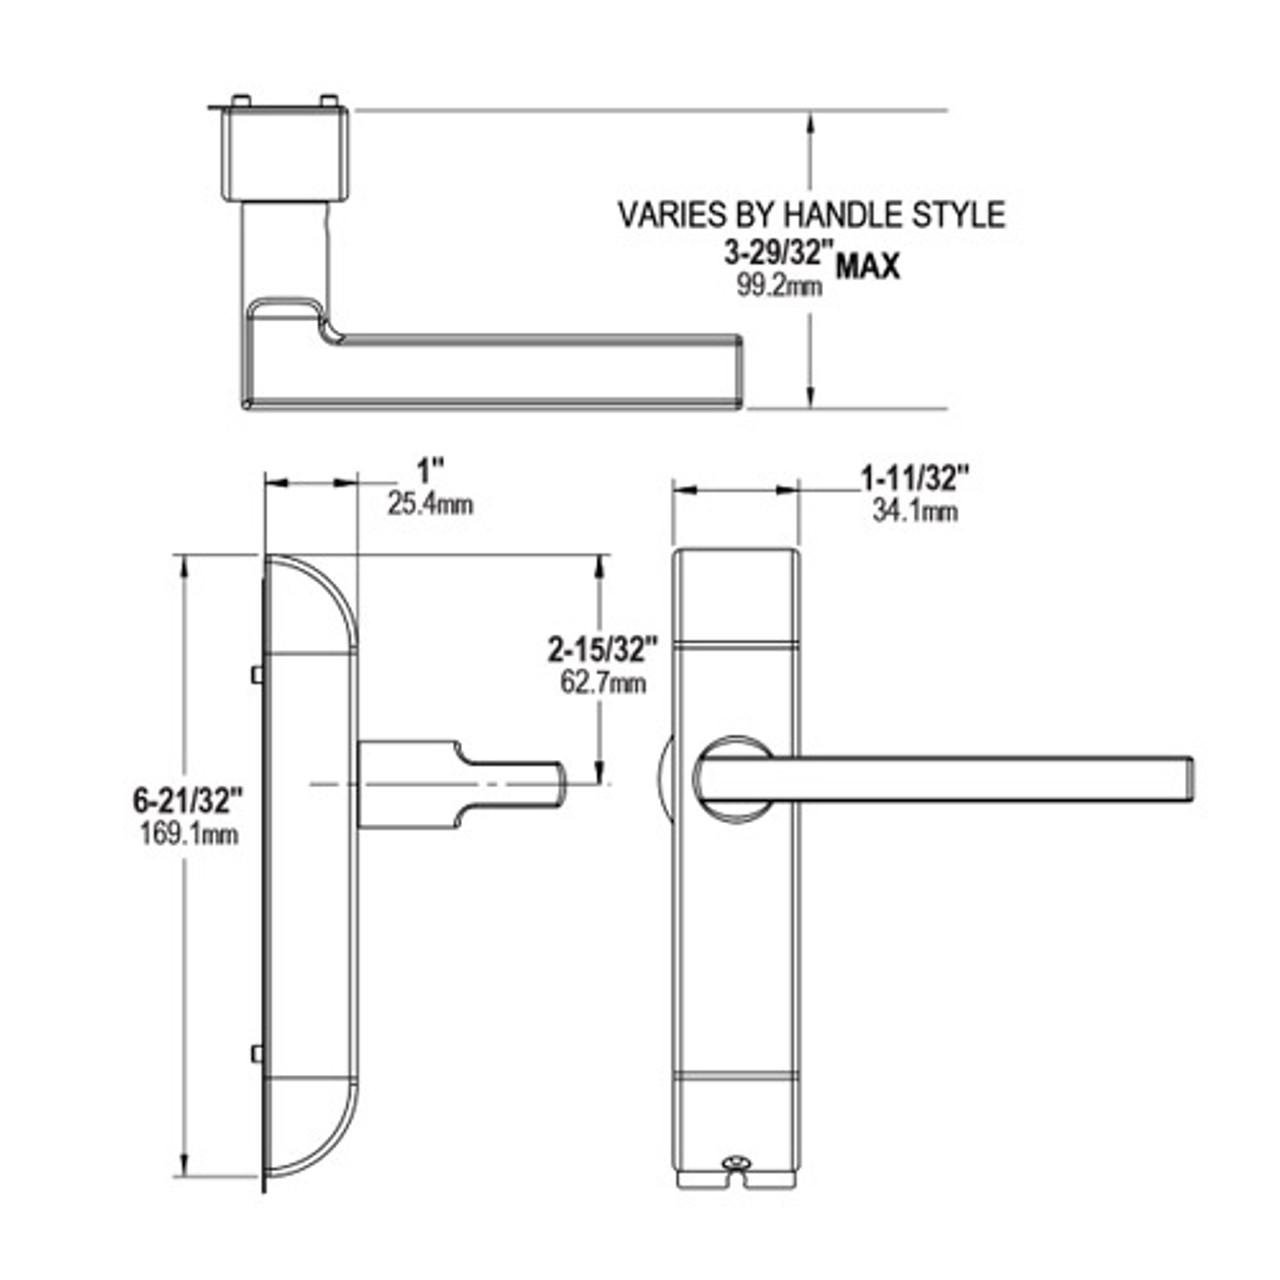 4600M-MW-632-US32 Adams Rite MW Designer handle Dimensional View